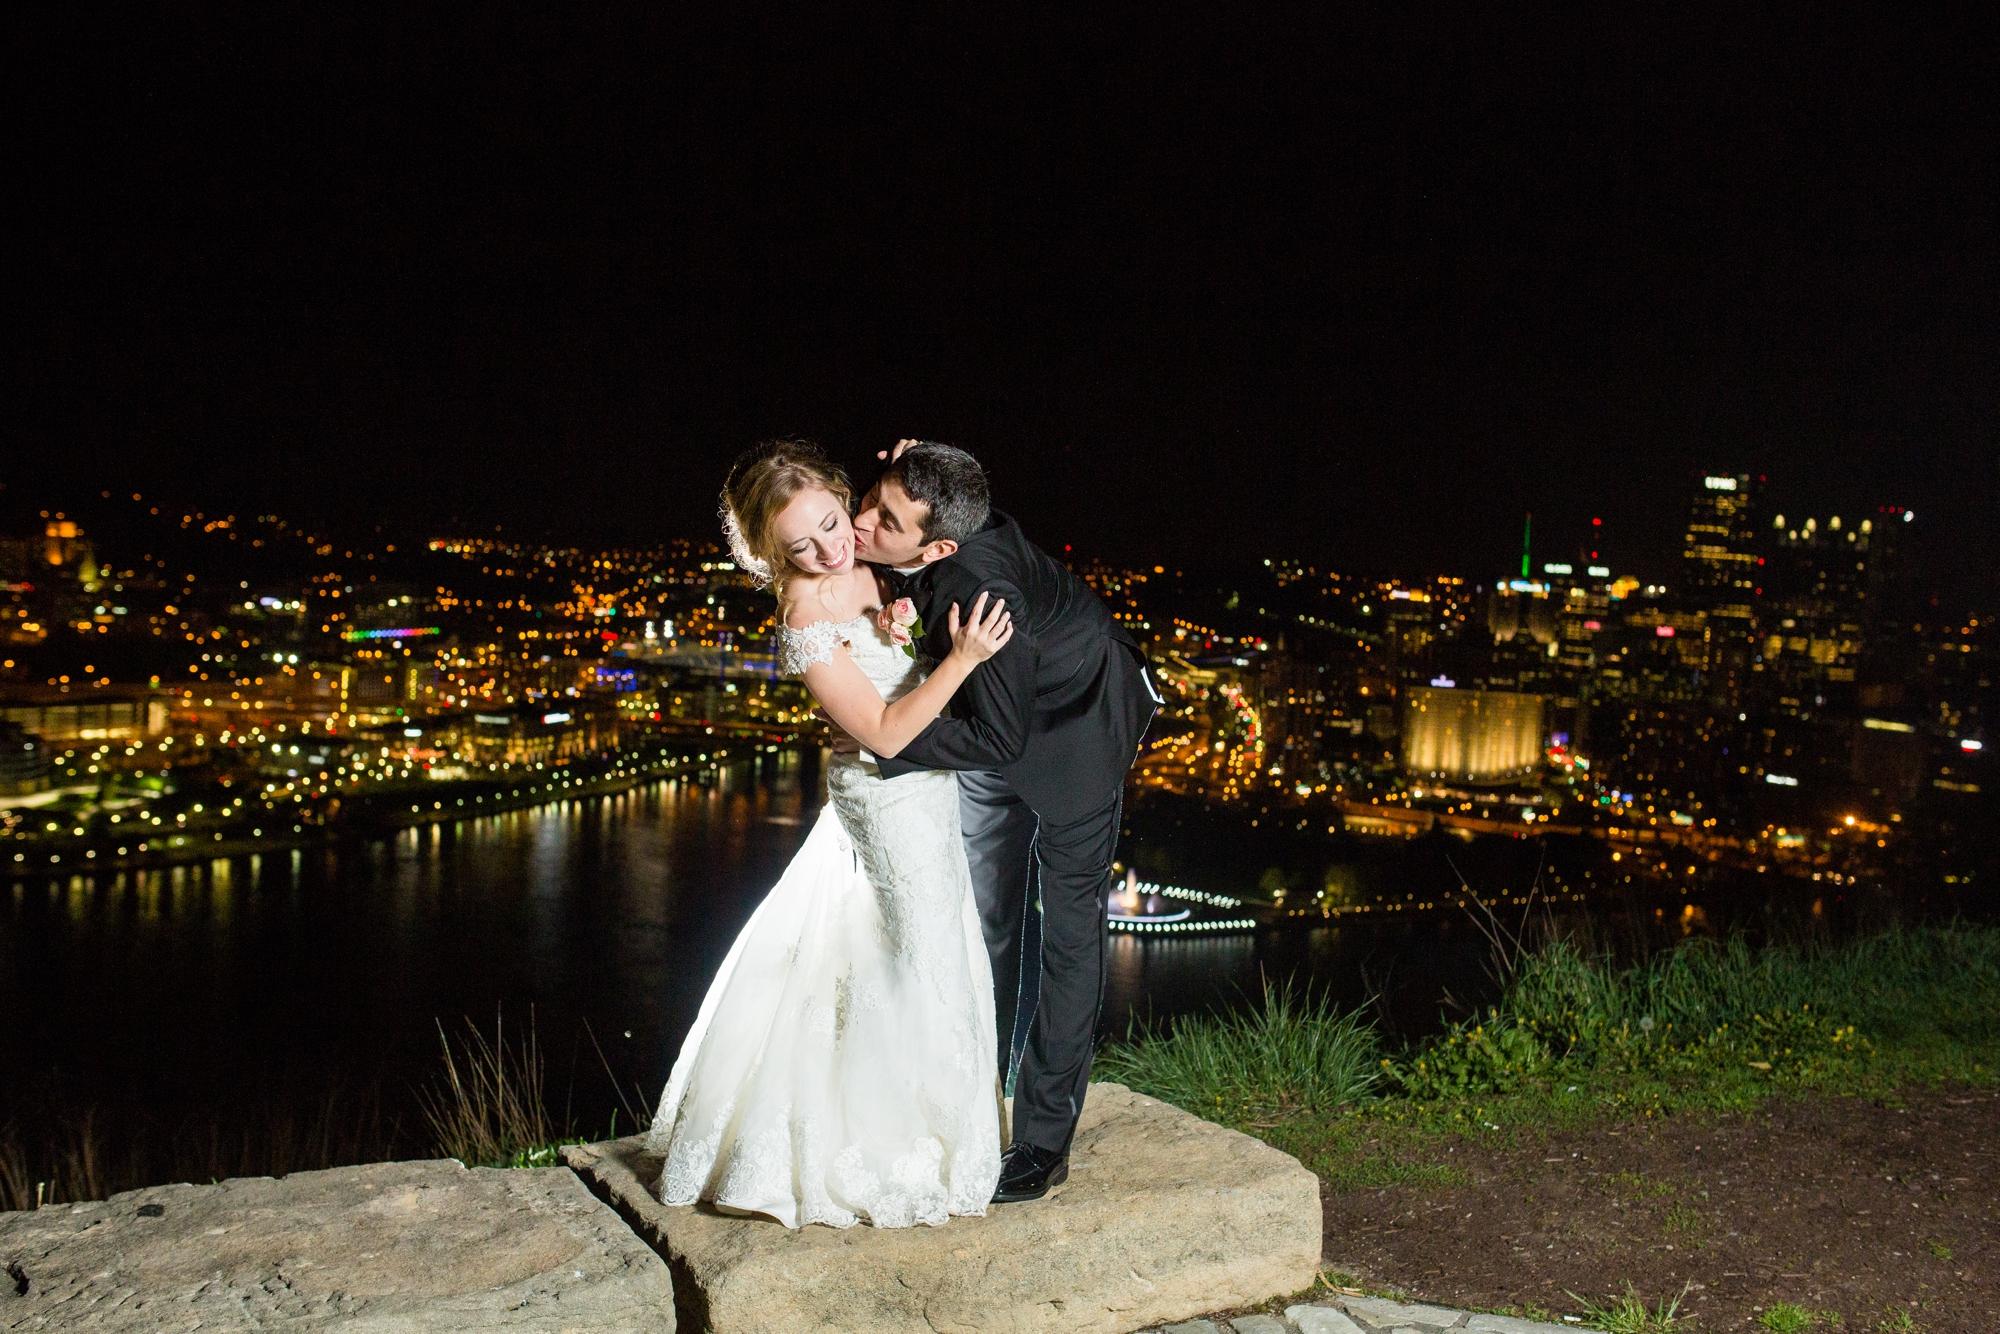 On Mount Washington in Pittsburgh, PA